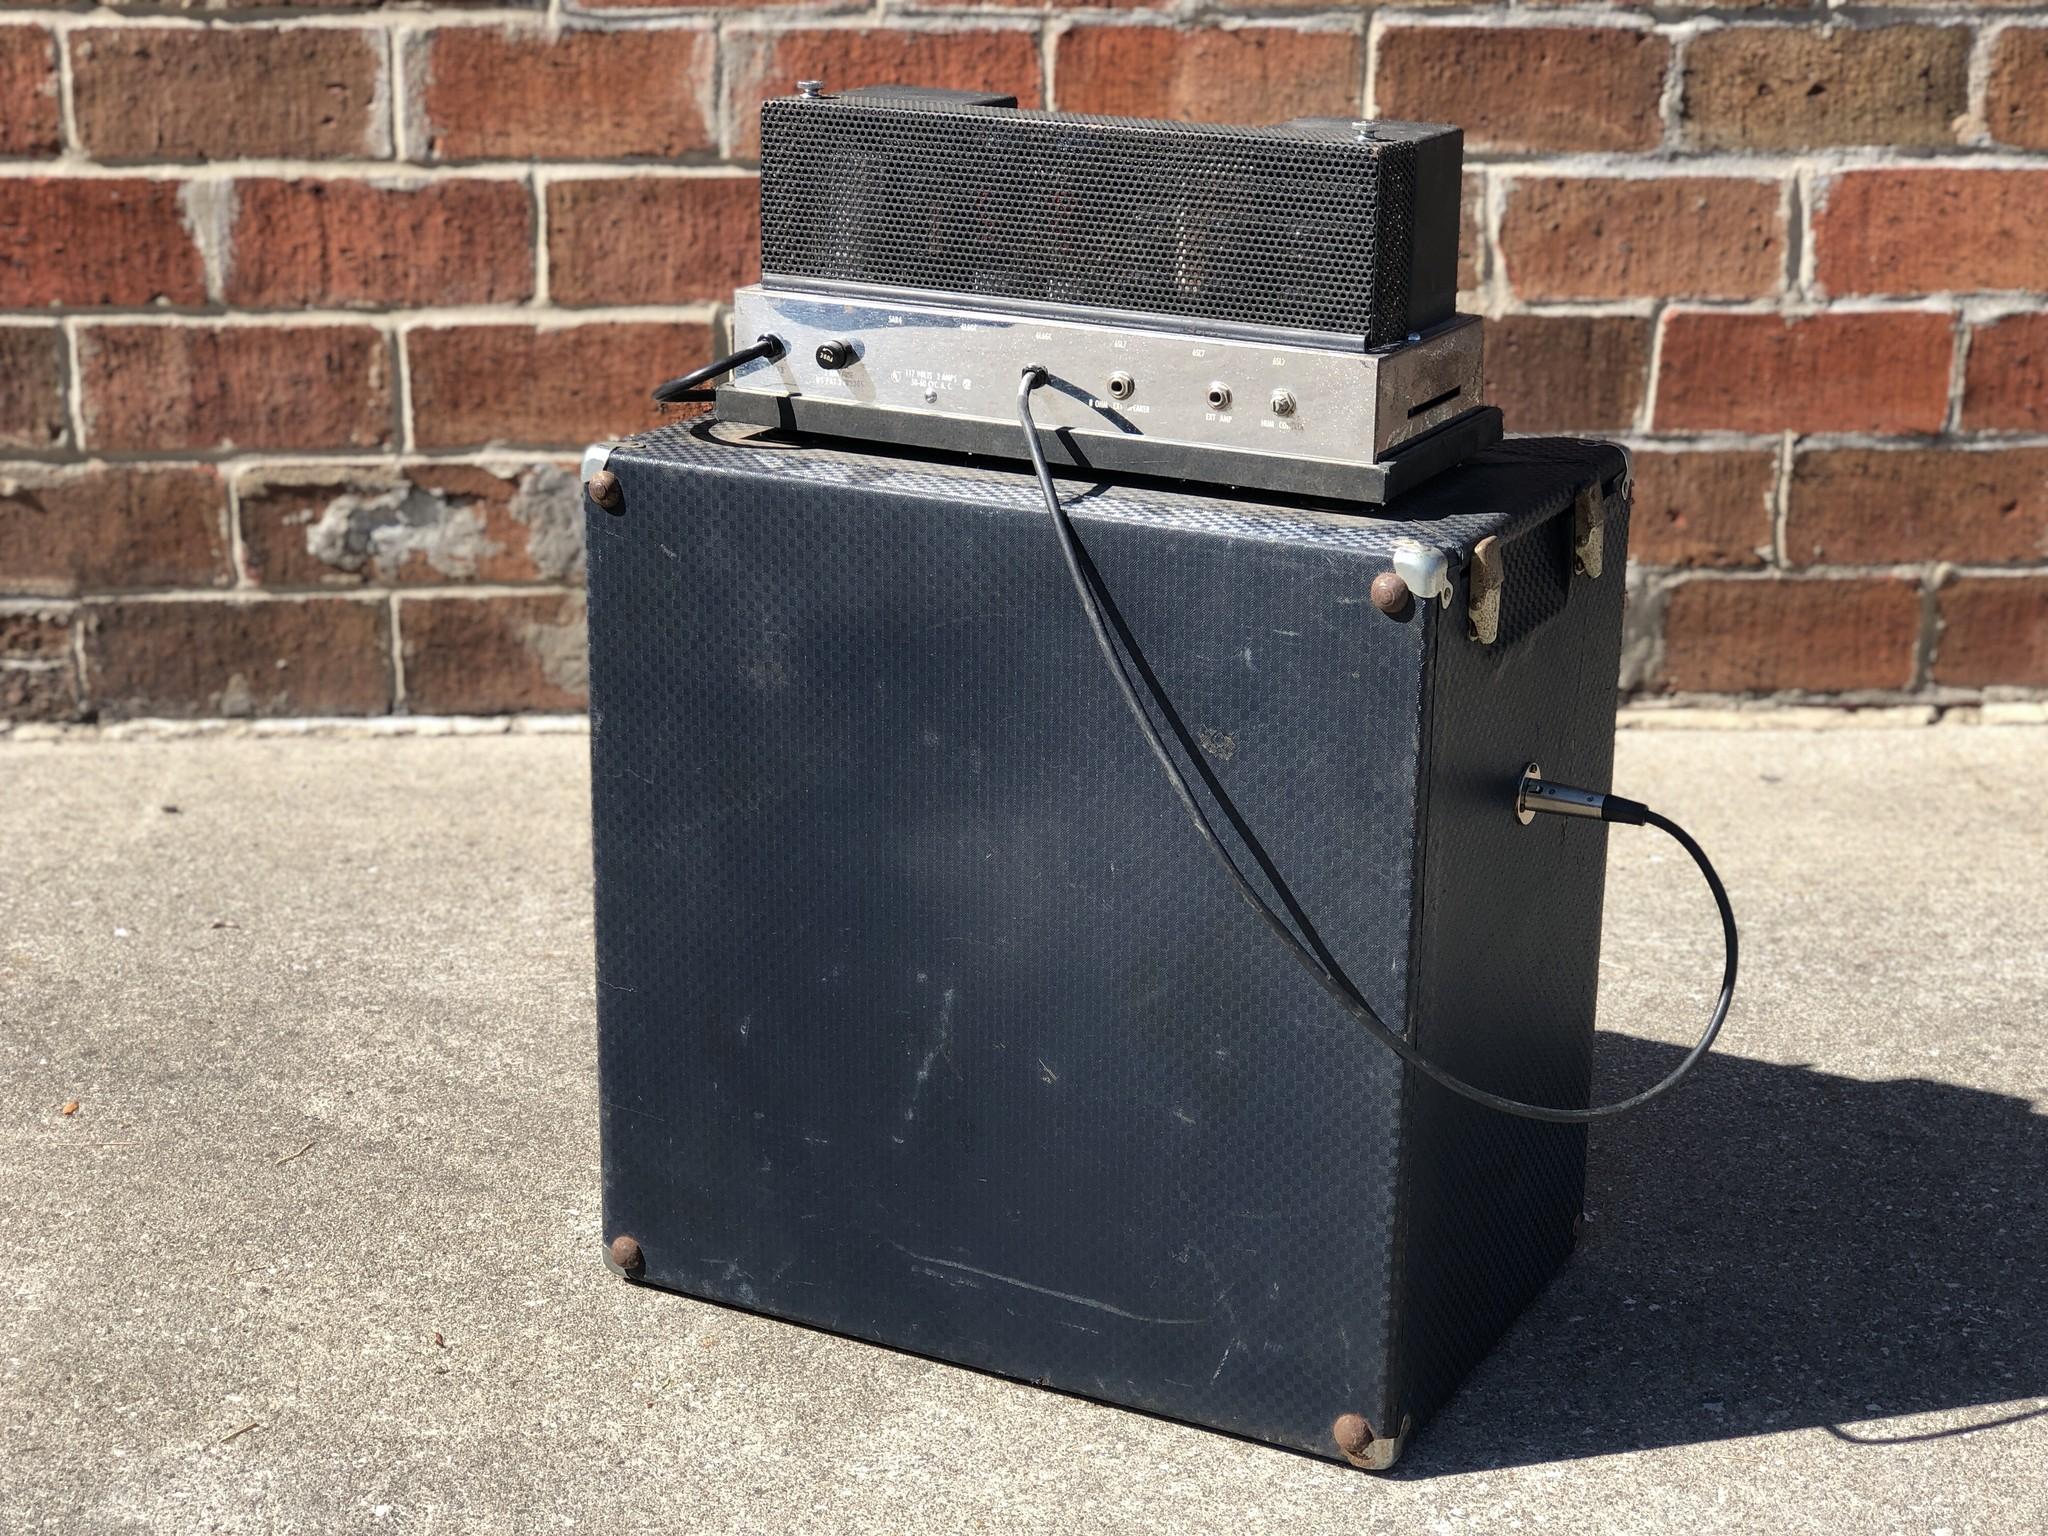 1966 Ampeg Portaflex B15-8